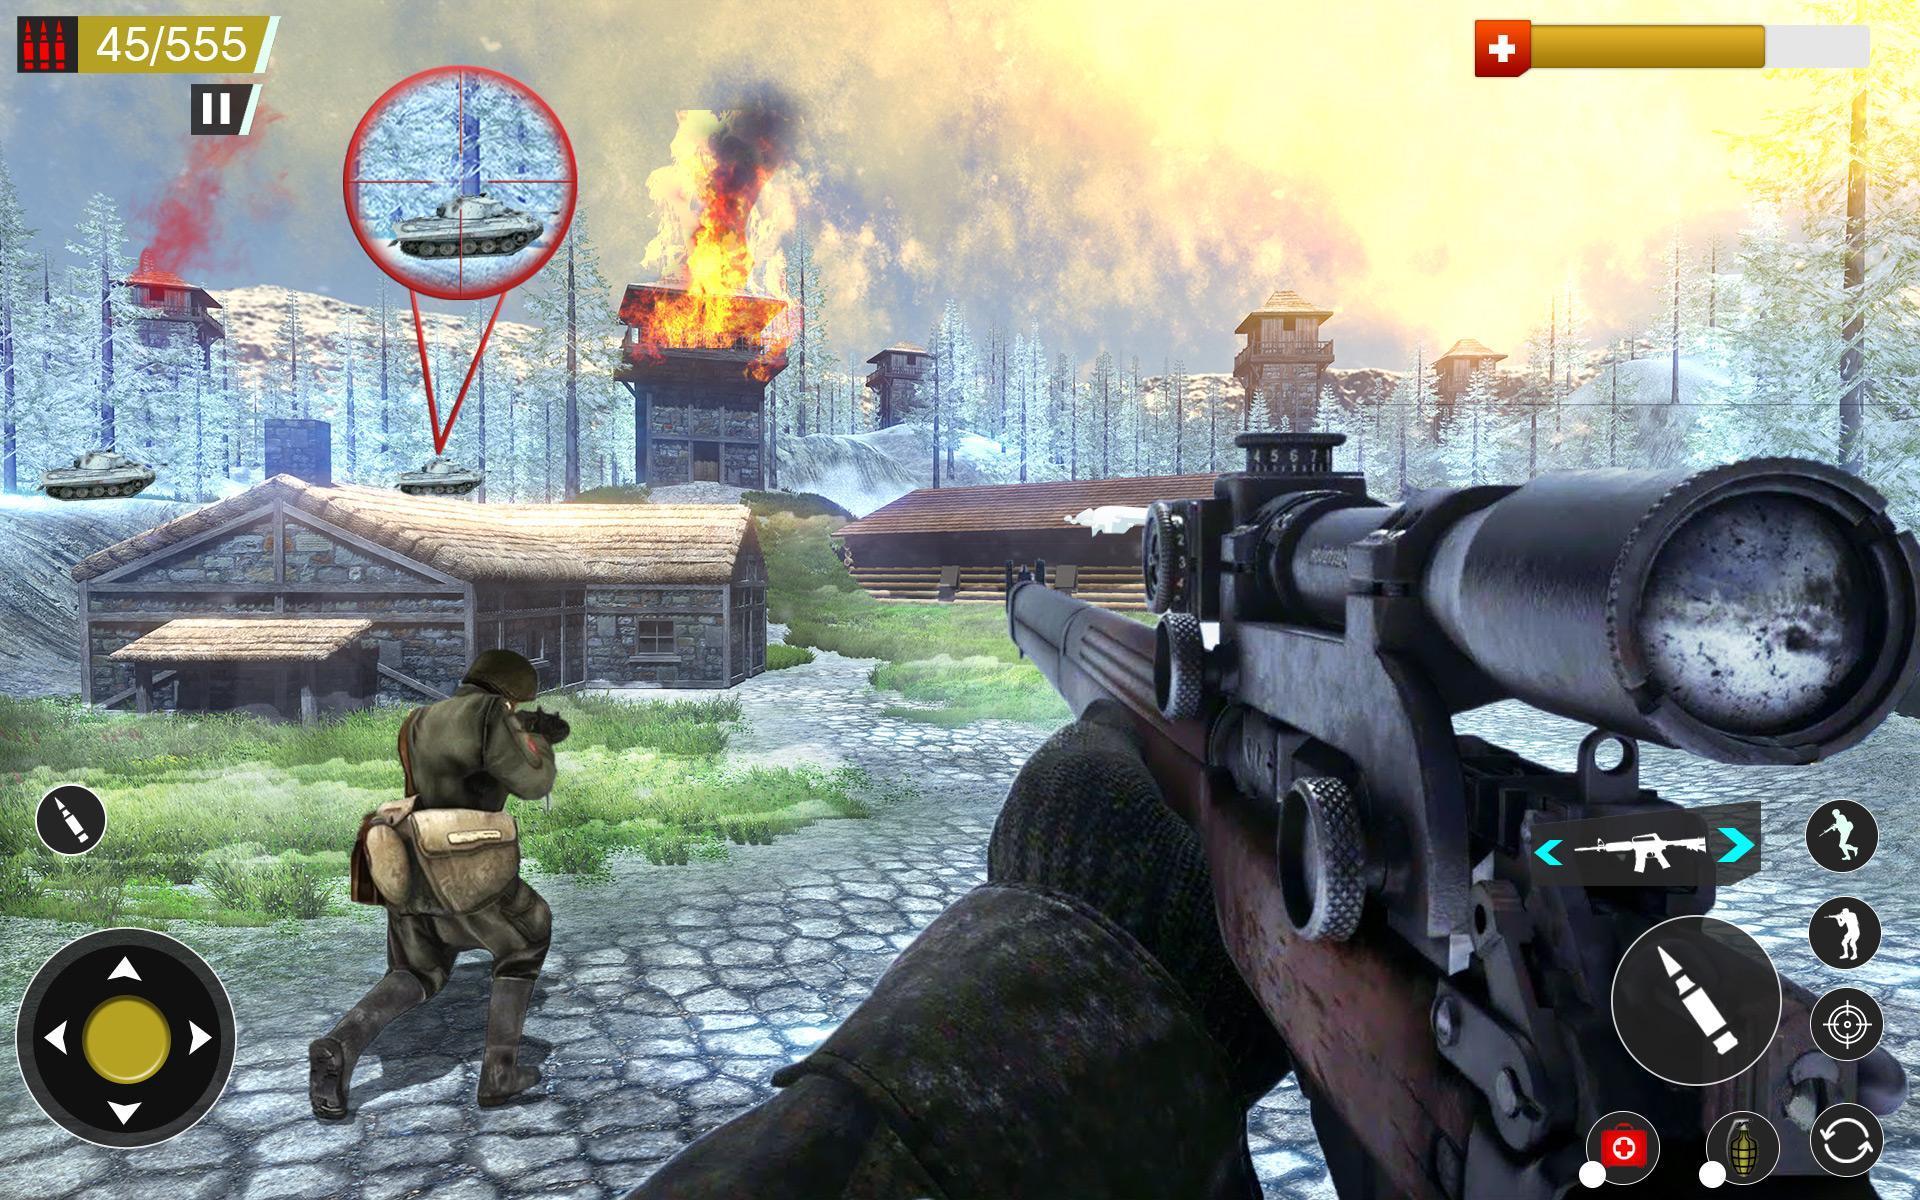 American World War Fps Shooter Free Shooting Games 4.8 Screenshot 4